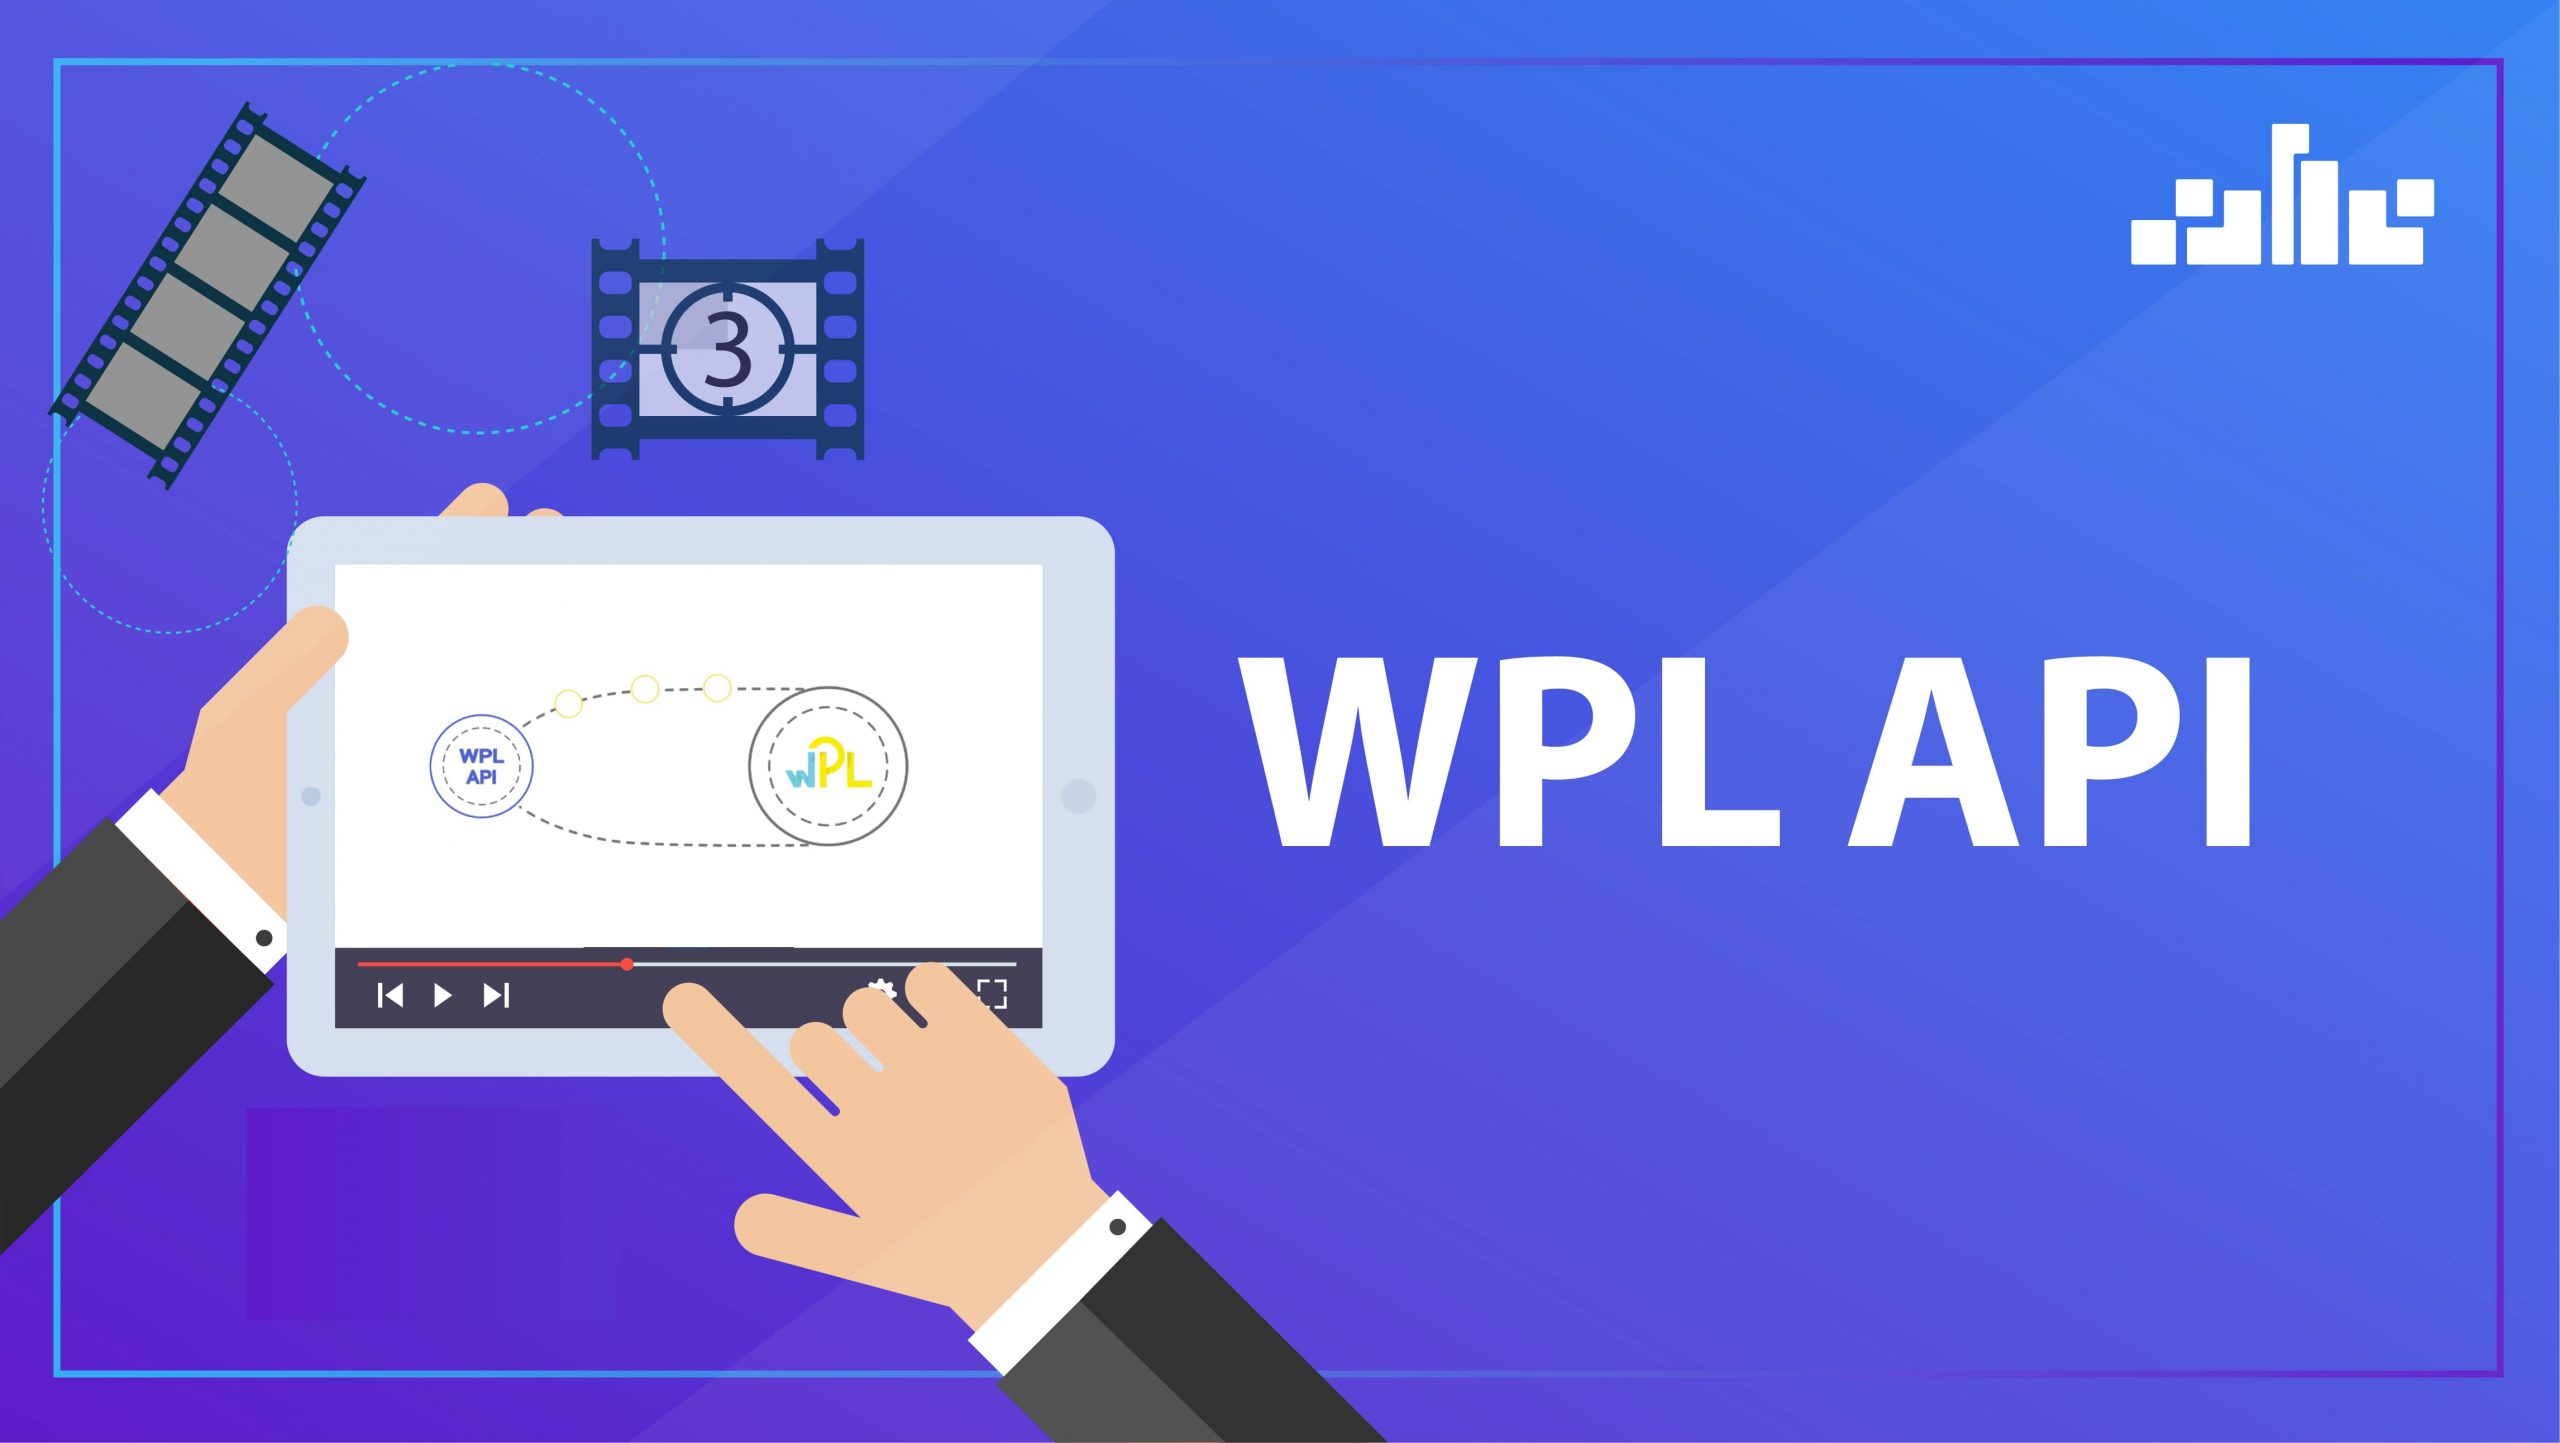 WPL API